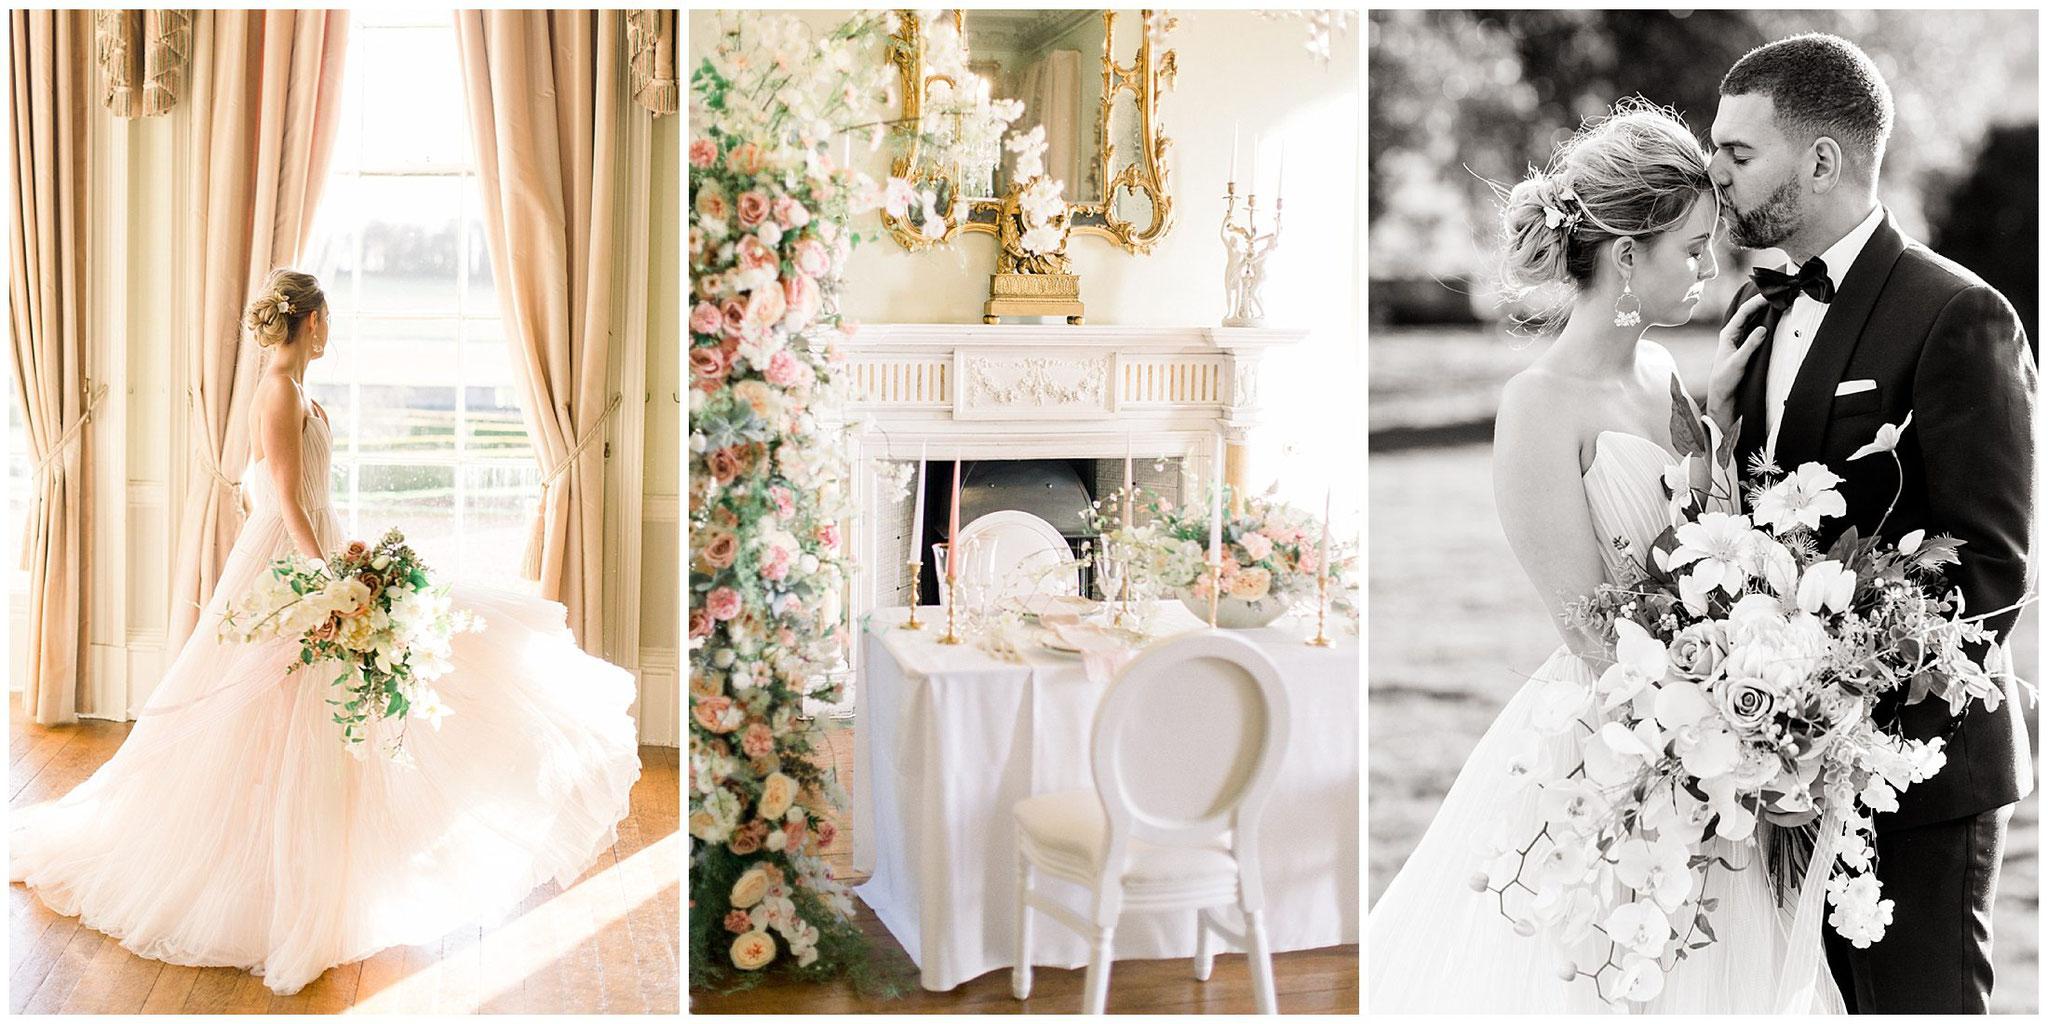 fine art wedding photographer Jane weber England uk prestwold hall table setting flower